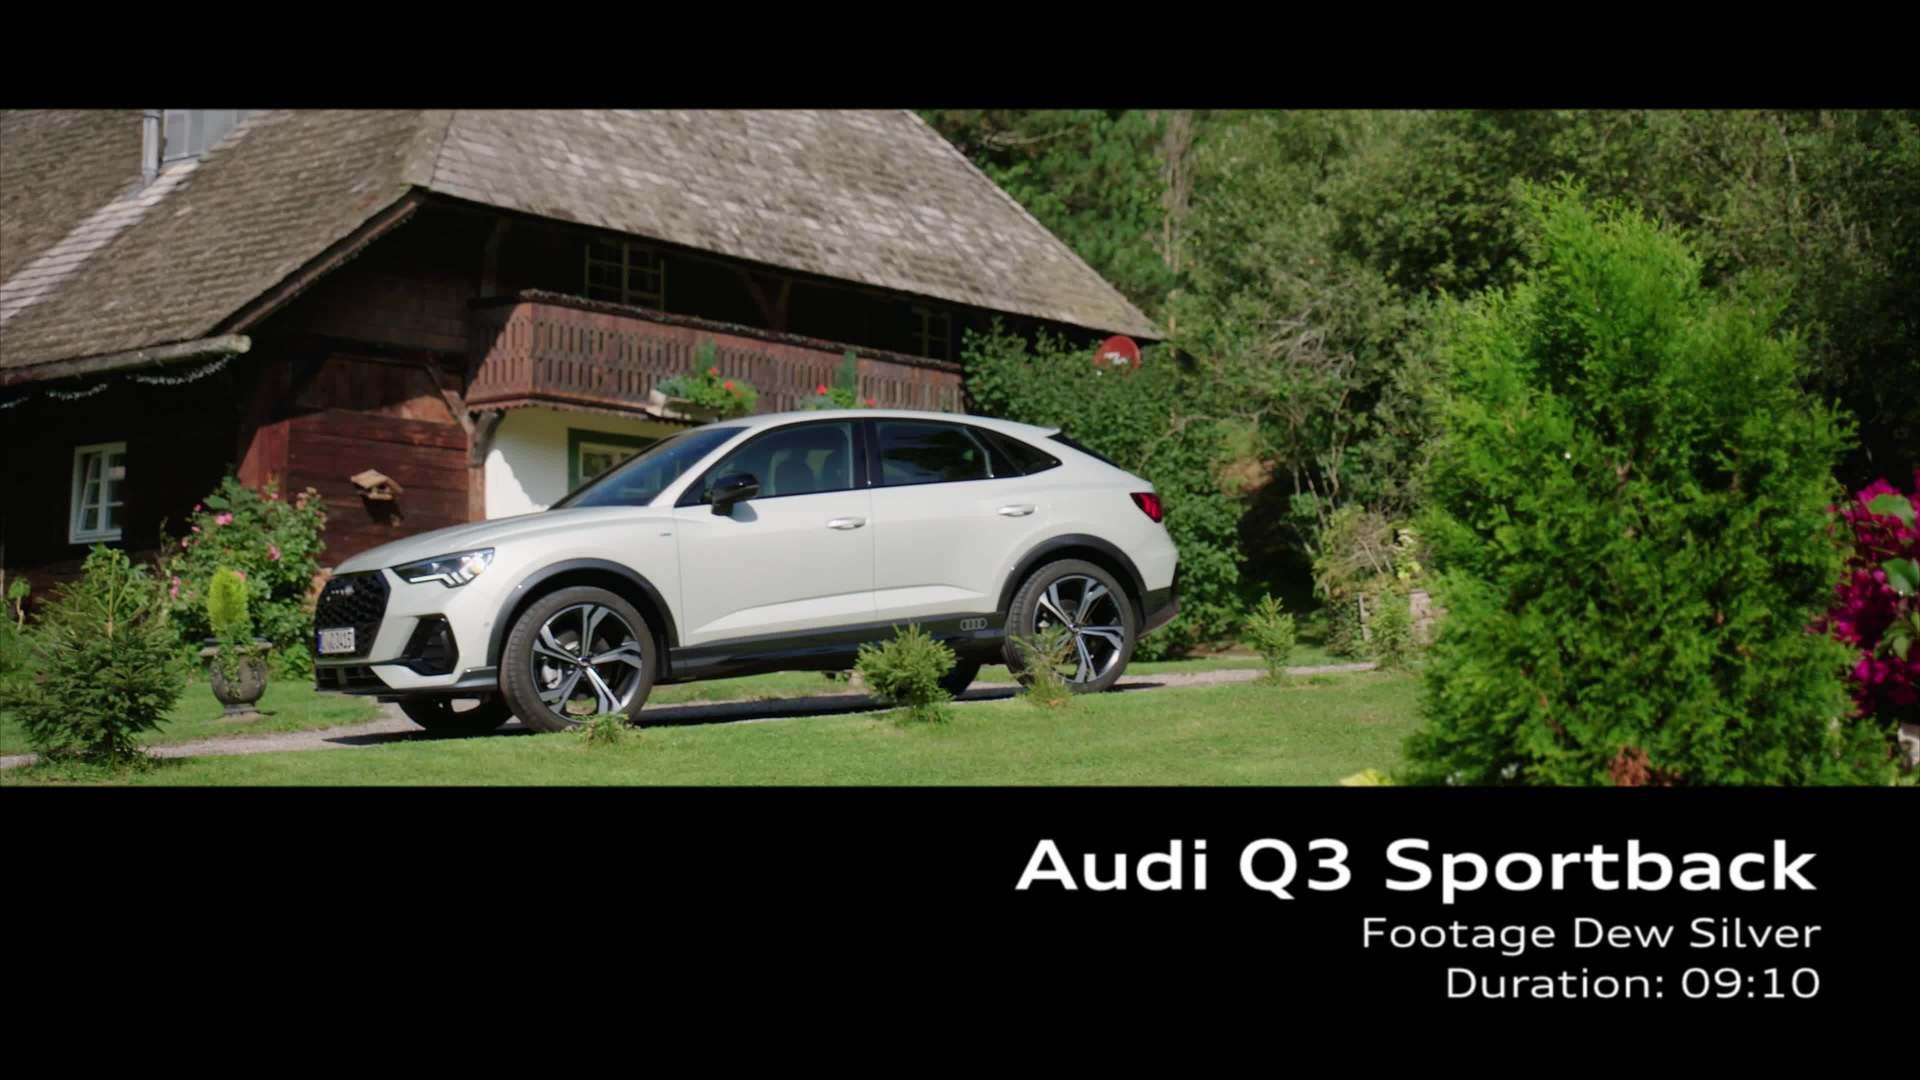 Audi Q3 Sportback Tausilber (Footage)